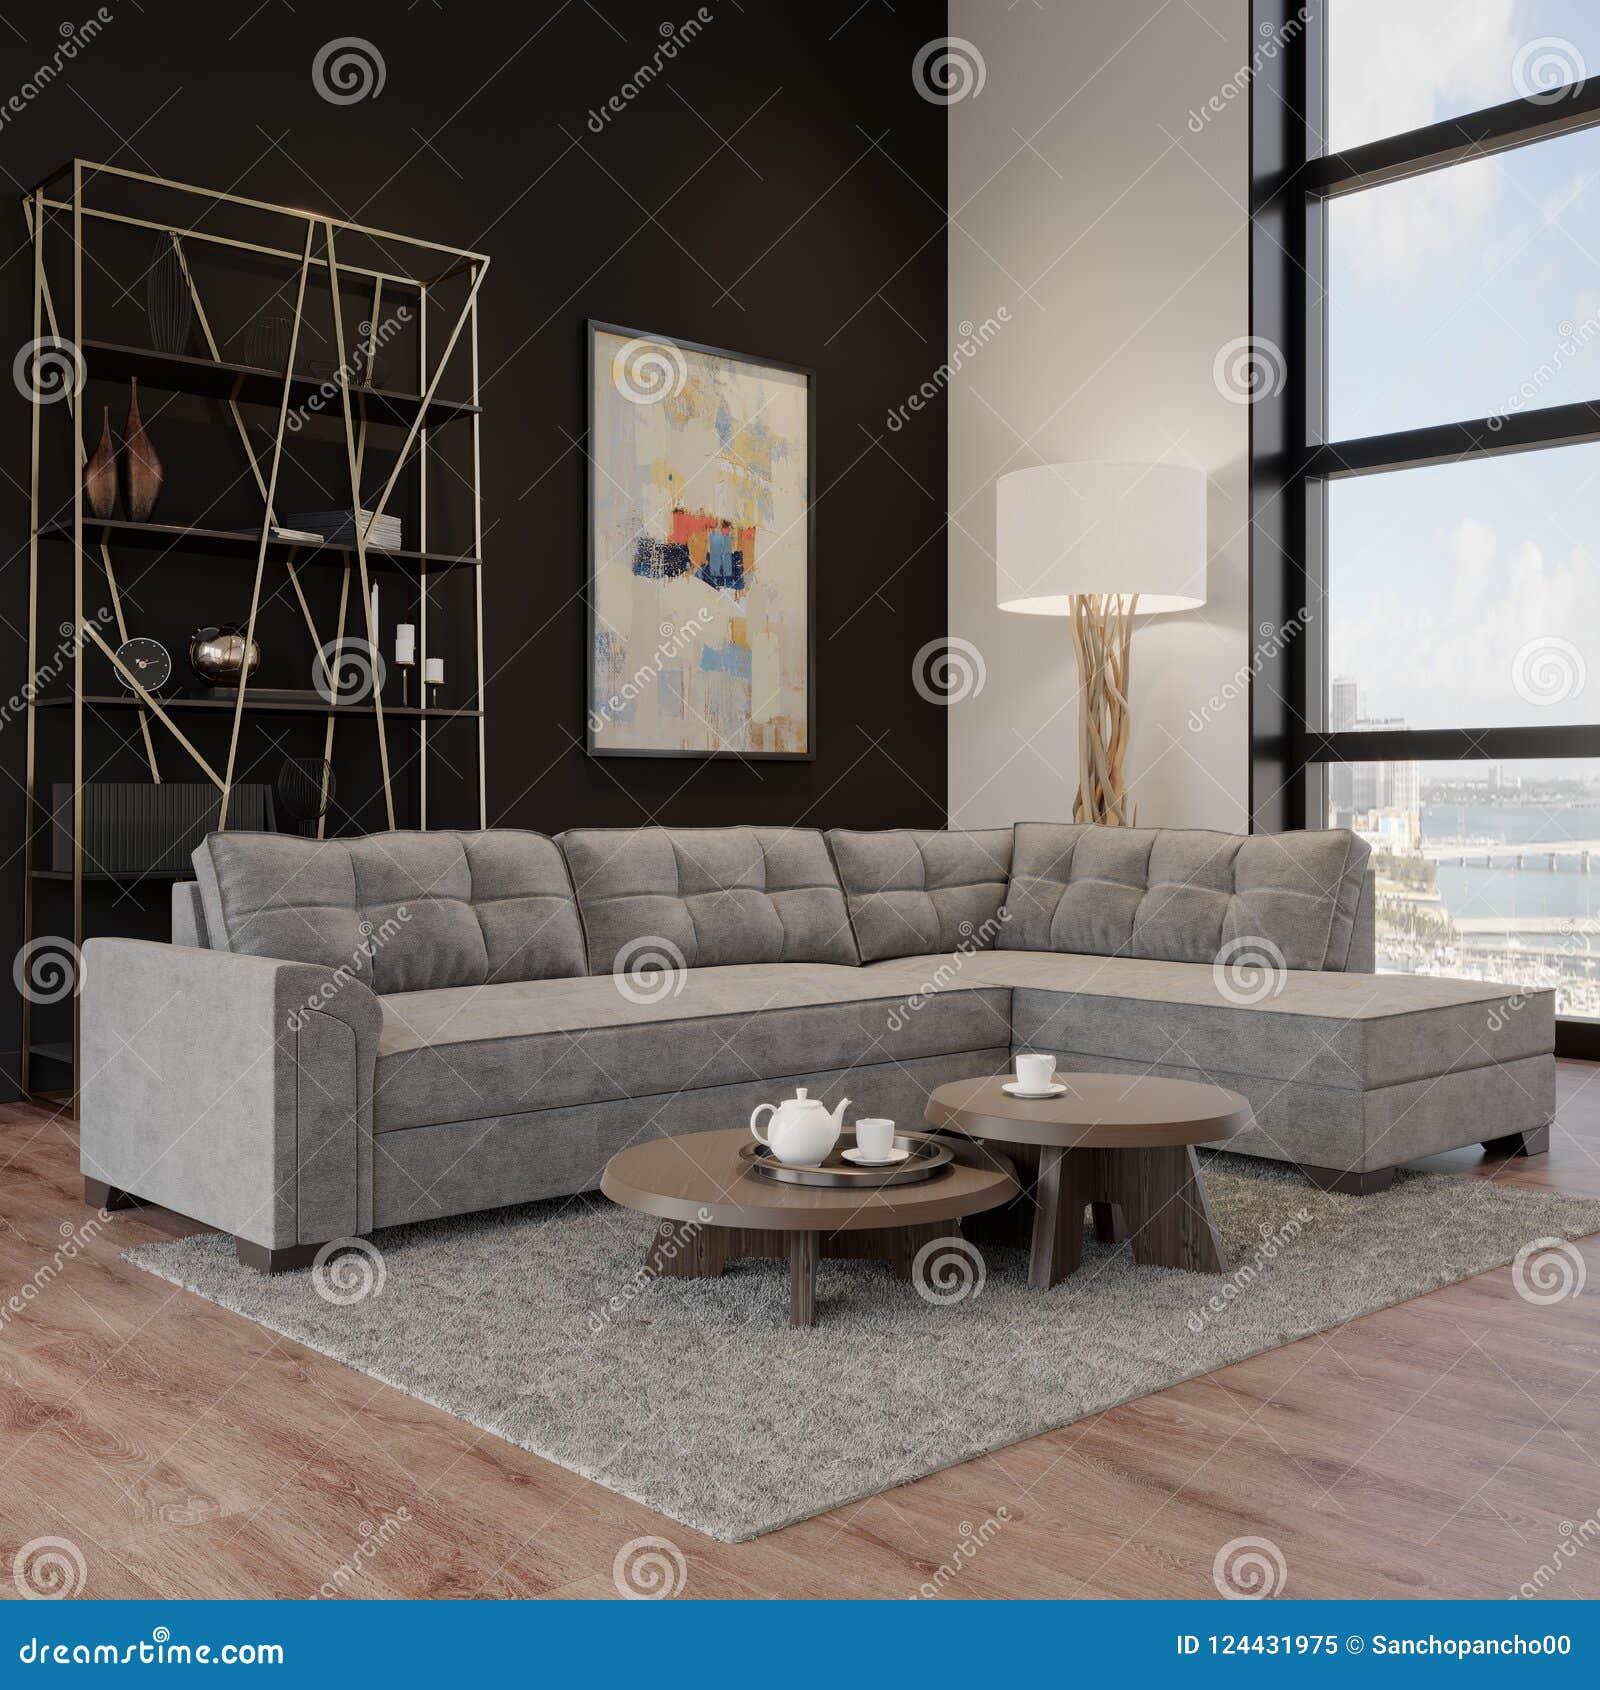 Modern Living Room Design With Panoramic Windows Stock Image Image Of Carpet Metal 124431975